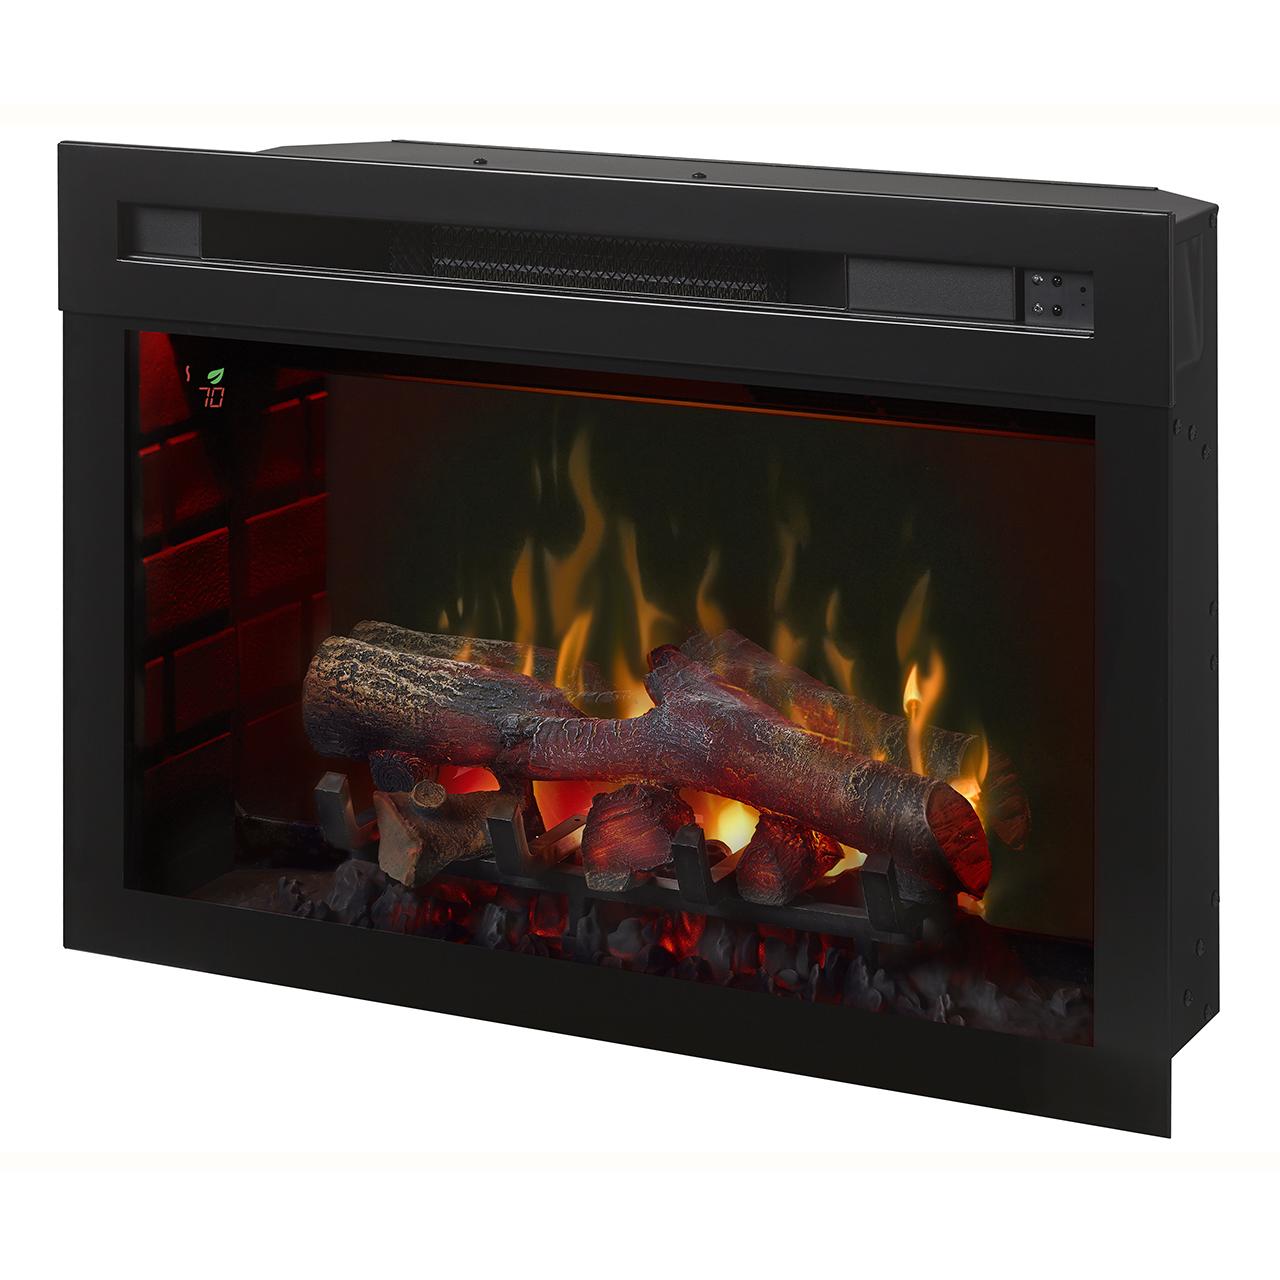 Dimplex 25 Multi Fire Xd Electric Firebox Pf Hl